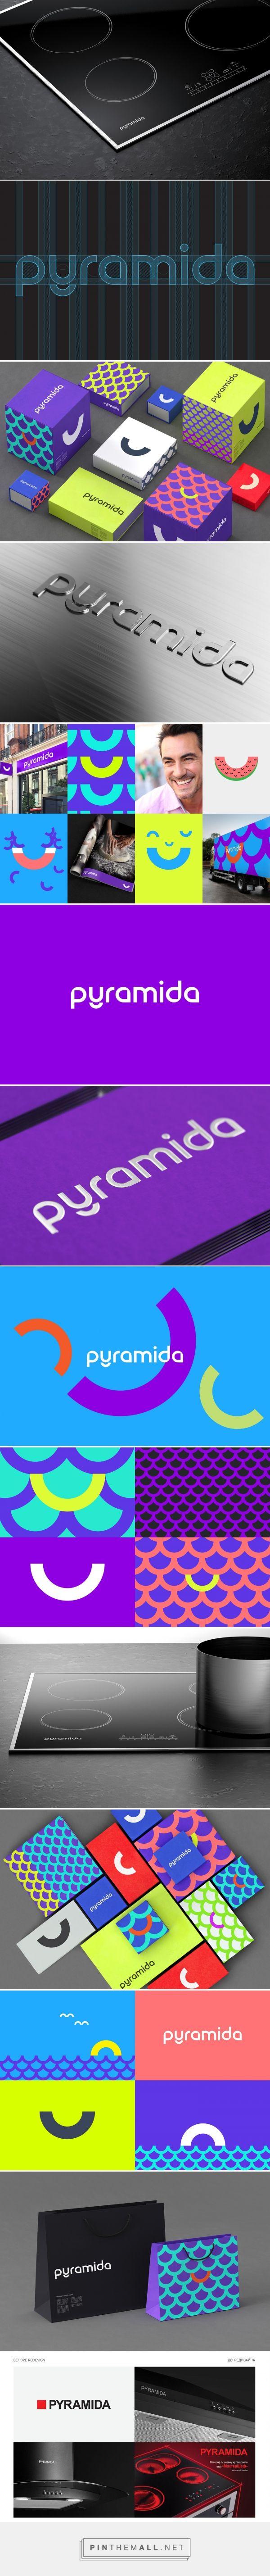 Pyramida - Brand Identity